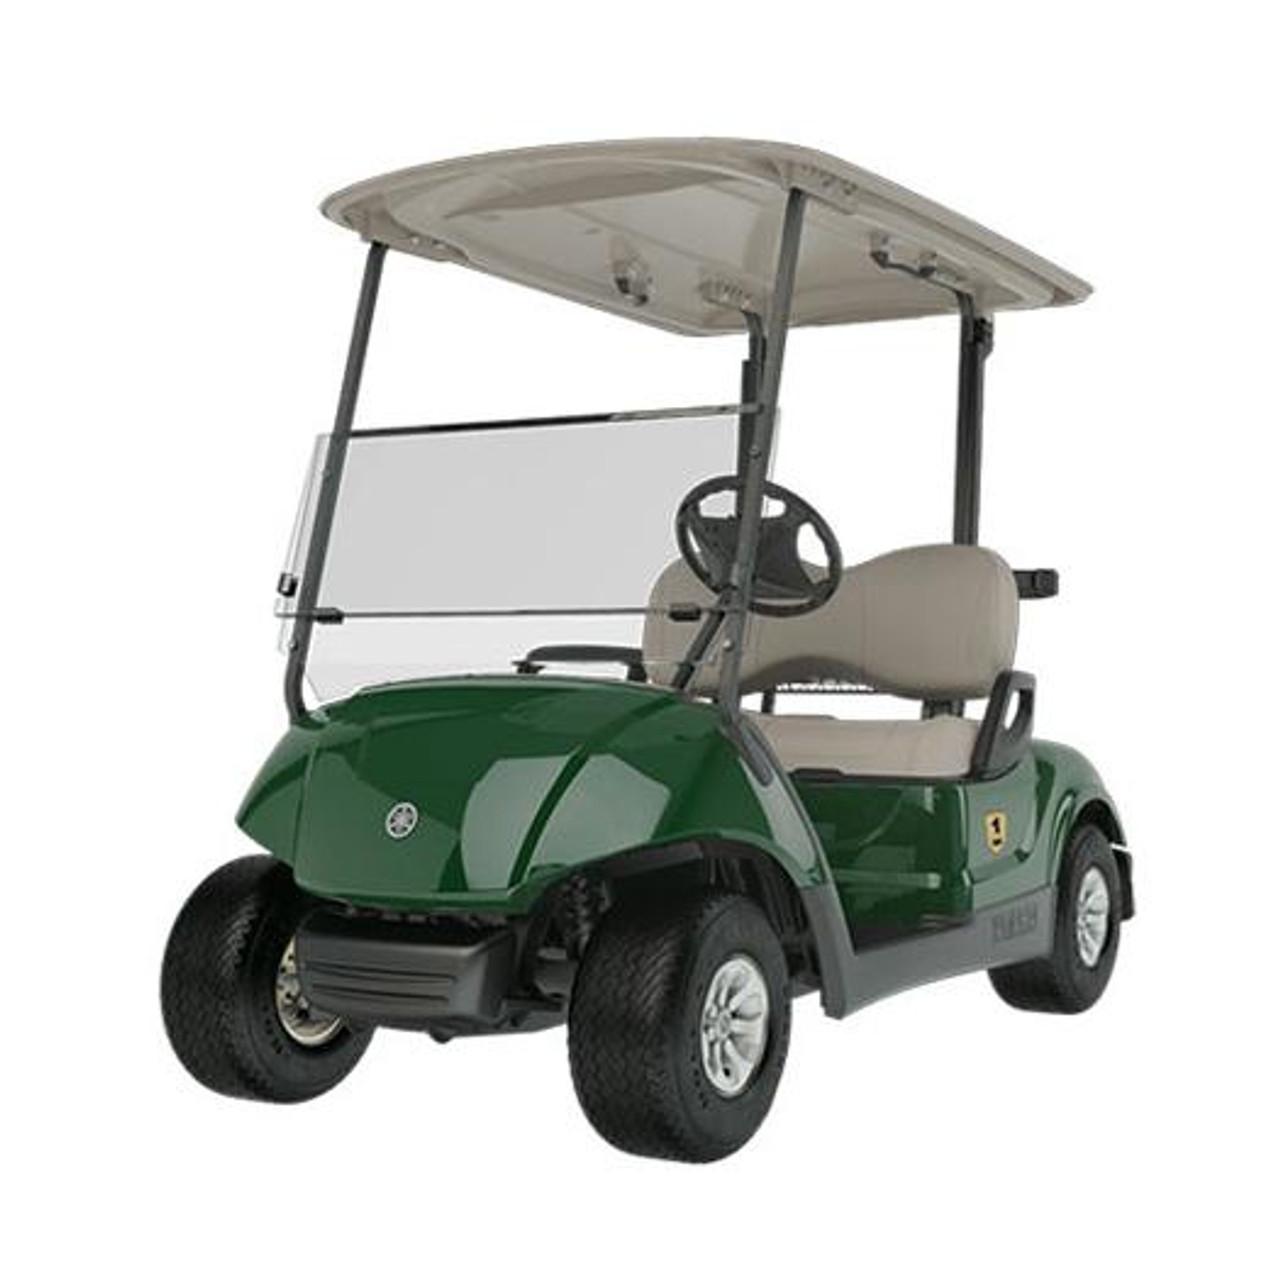 Yamaha Golf Cart Light Kit - G2, G9, G14, G16, Drive & More on yamaha golf cart serial number, yamaha golf cart turn signals, yamaha electric golf cart, club car wiring diagram, yamaha golf cart wheels, yamaha g9 golf cart, yamaha golf cart generator, golf cart electrical system diagram, yamaha golf cars, yamaha wiring-diagram g29, yamaha golf cart parts, yamaha g1 golf cart, yamaha marine part 703-82563-02, yamaha g2 golf cart, yamaha motorcycle wiring diagrams, yamaha parts diagram, yamaha g9 wiring-diagram, yamaha ydre wiring-diagram, yamaha golf cart repair manual, yamaha xs650 wiring-diagram,